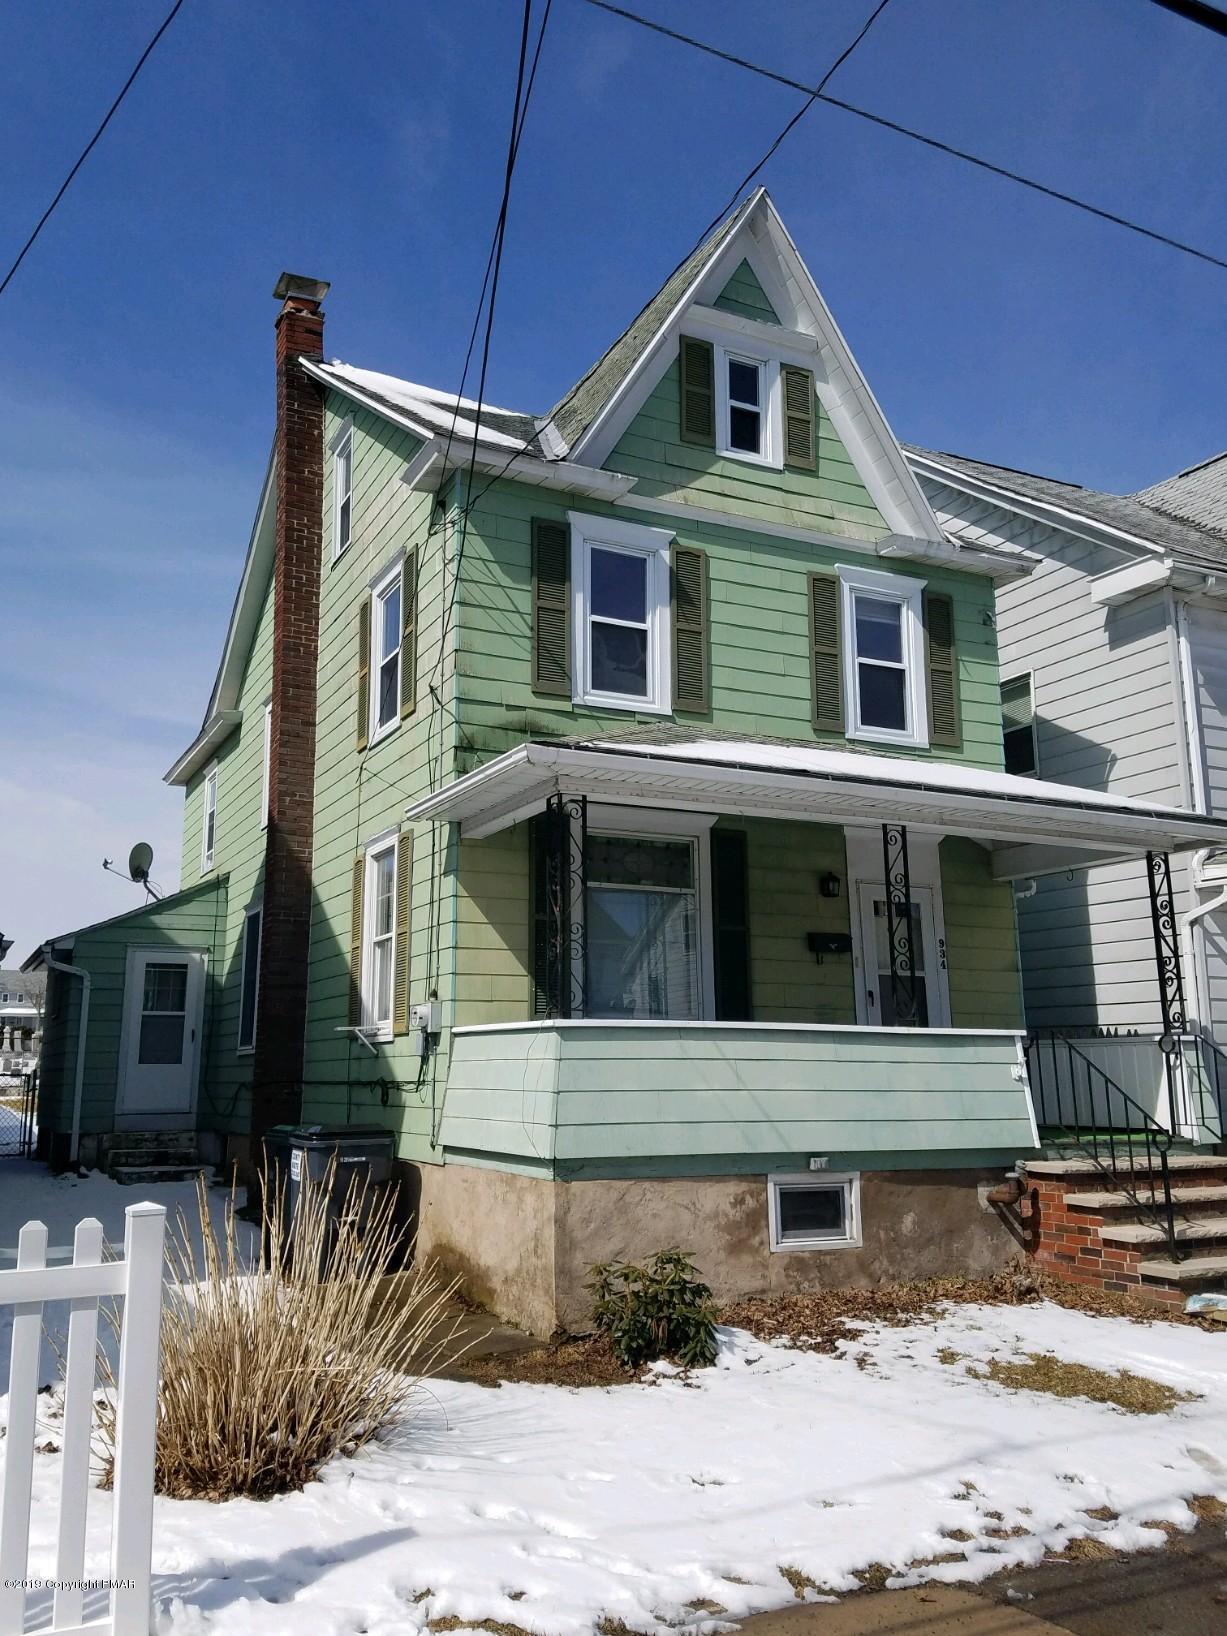 934 Birkbeck St., Freeland, PA 18224